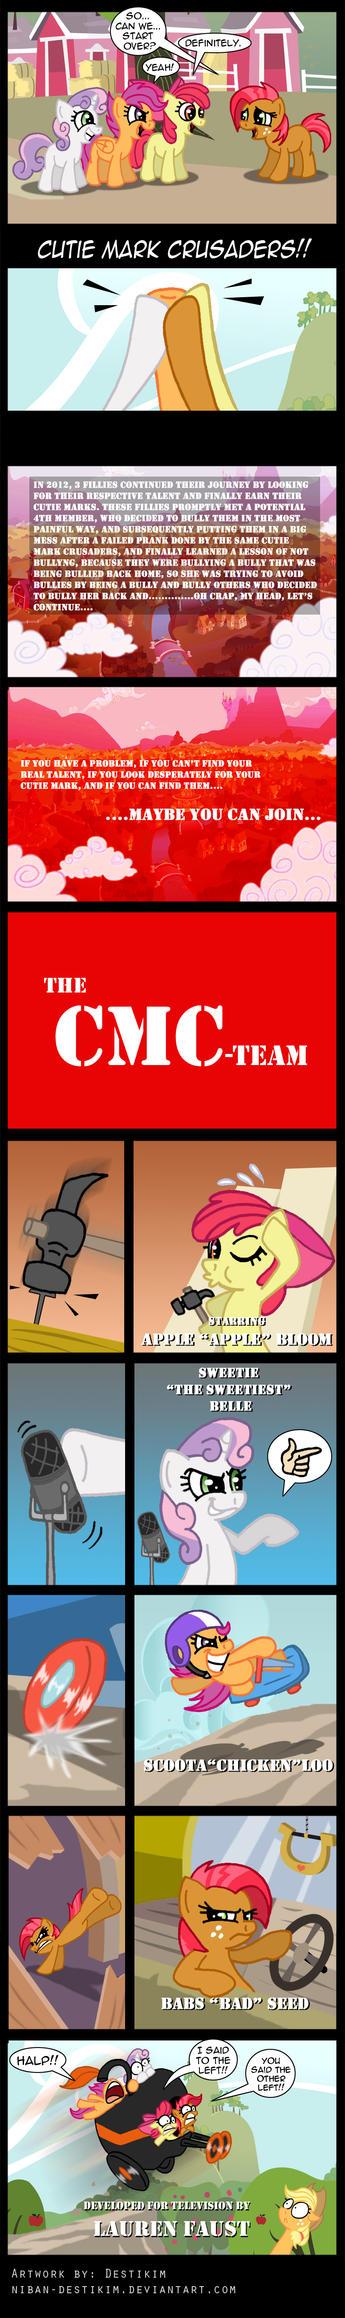 The CMC-Team by Niban-Destikim